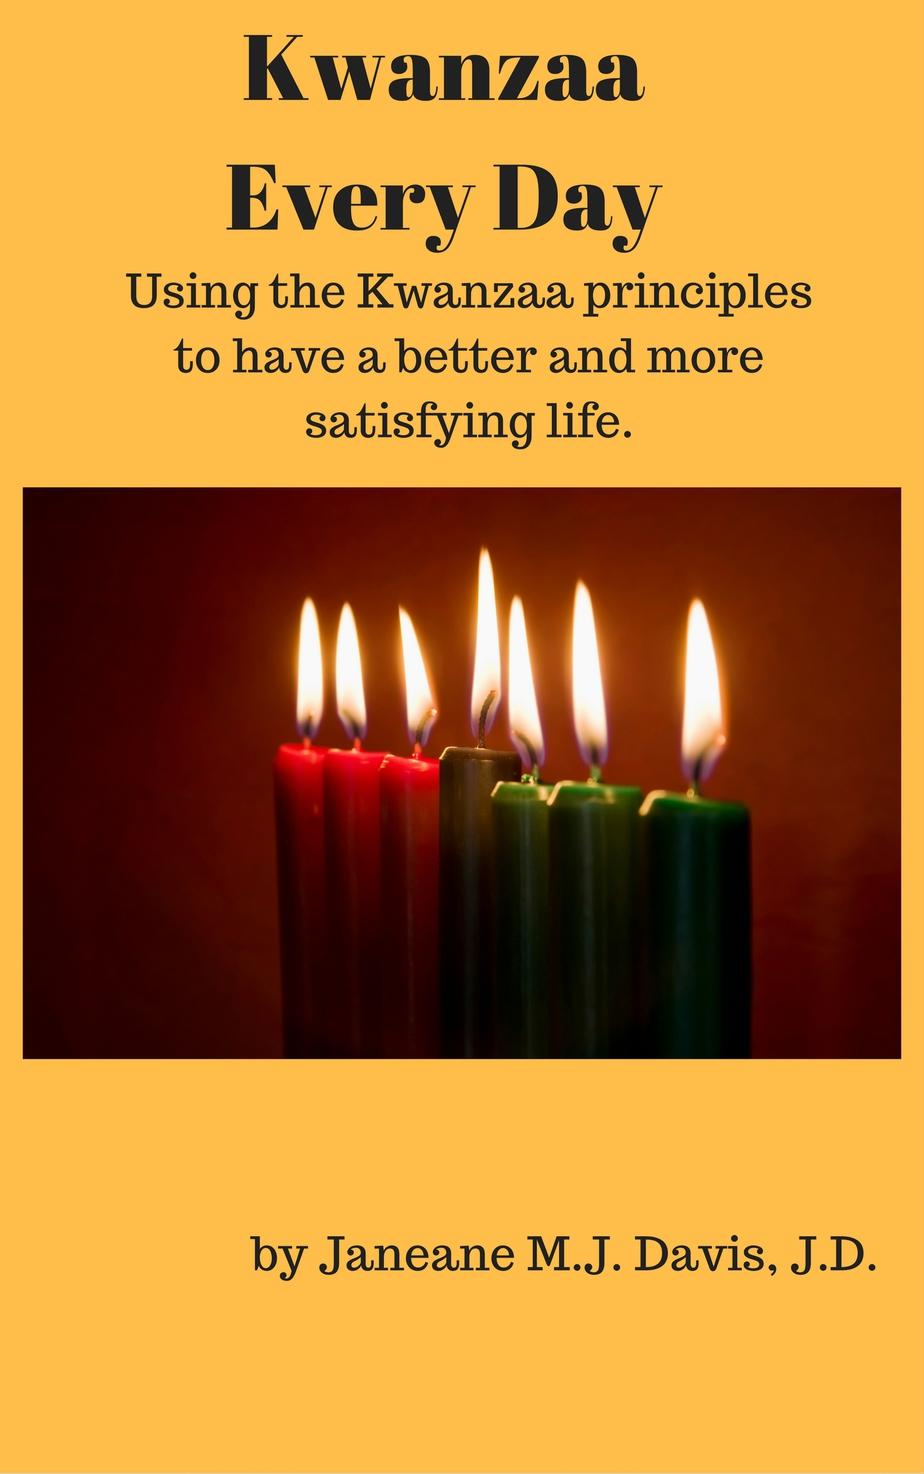 Kwanzaa Every Day 7 Day Challenge